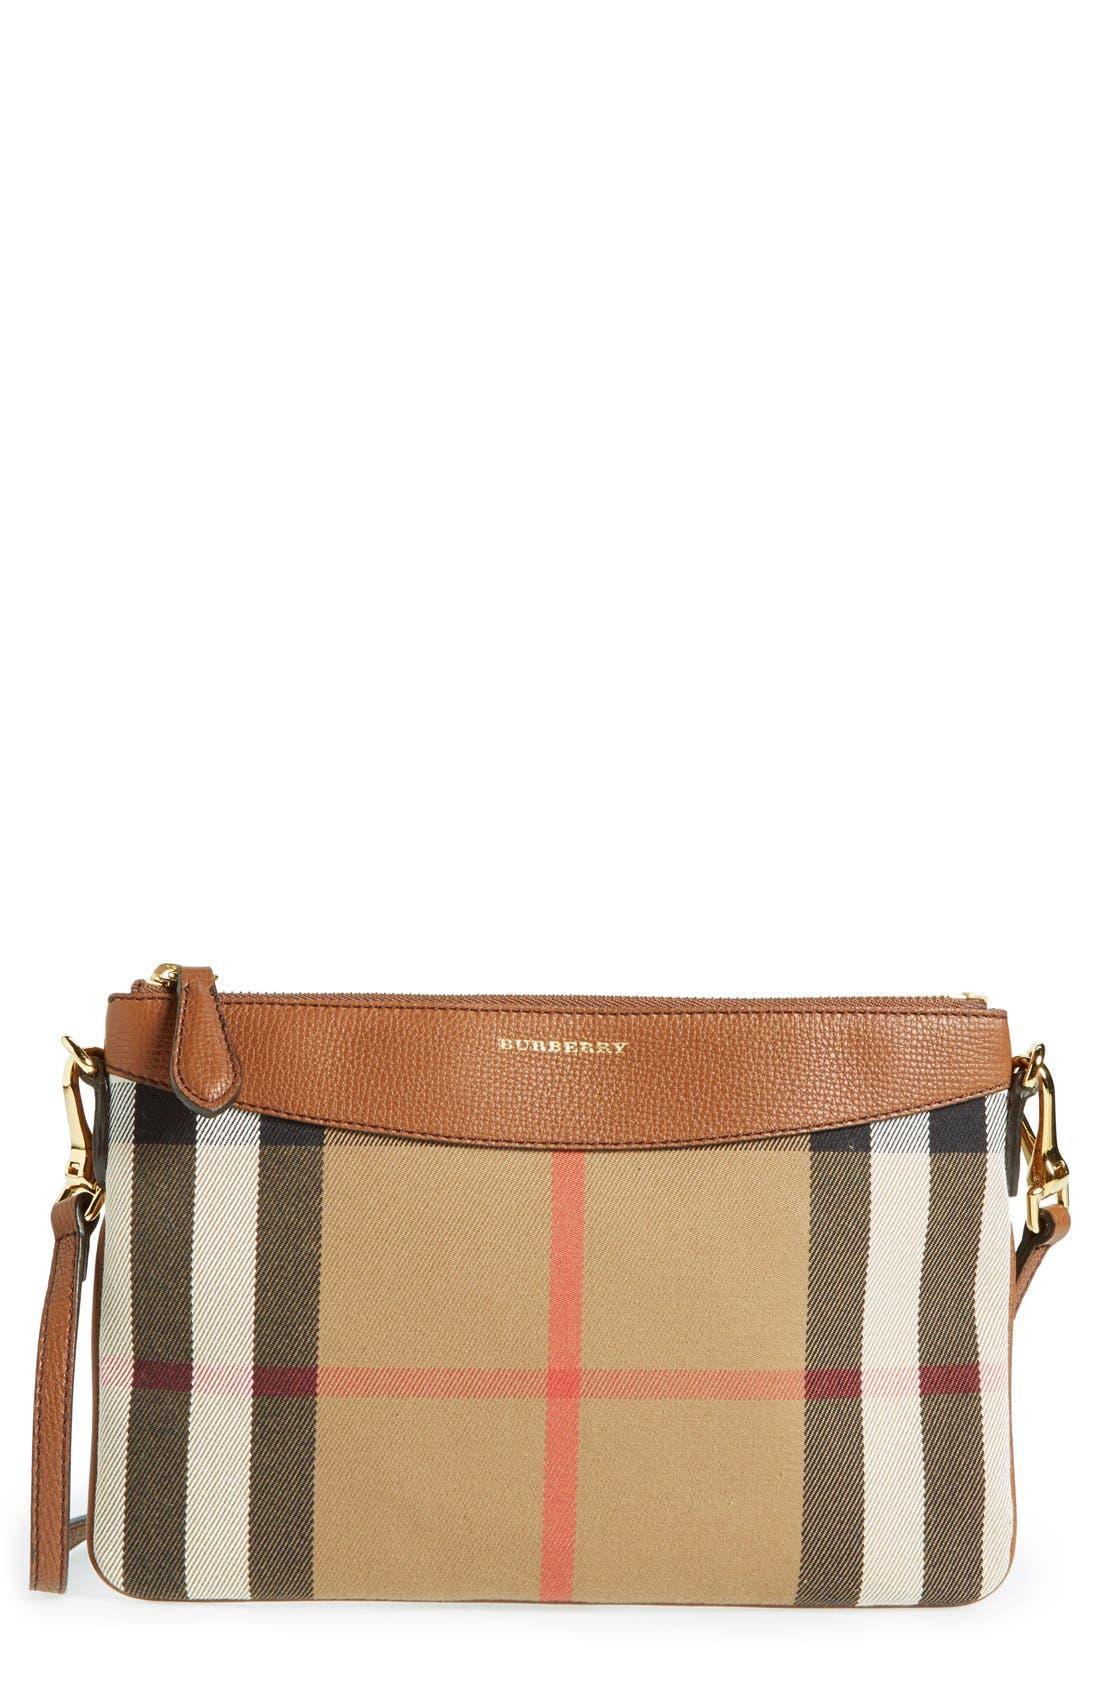 'Peyton - House Check' Crossbody Bag,                             Main thumbnail 1, color,                             250